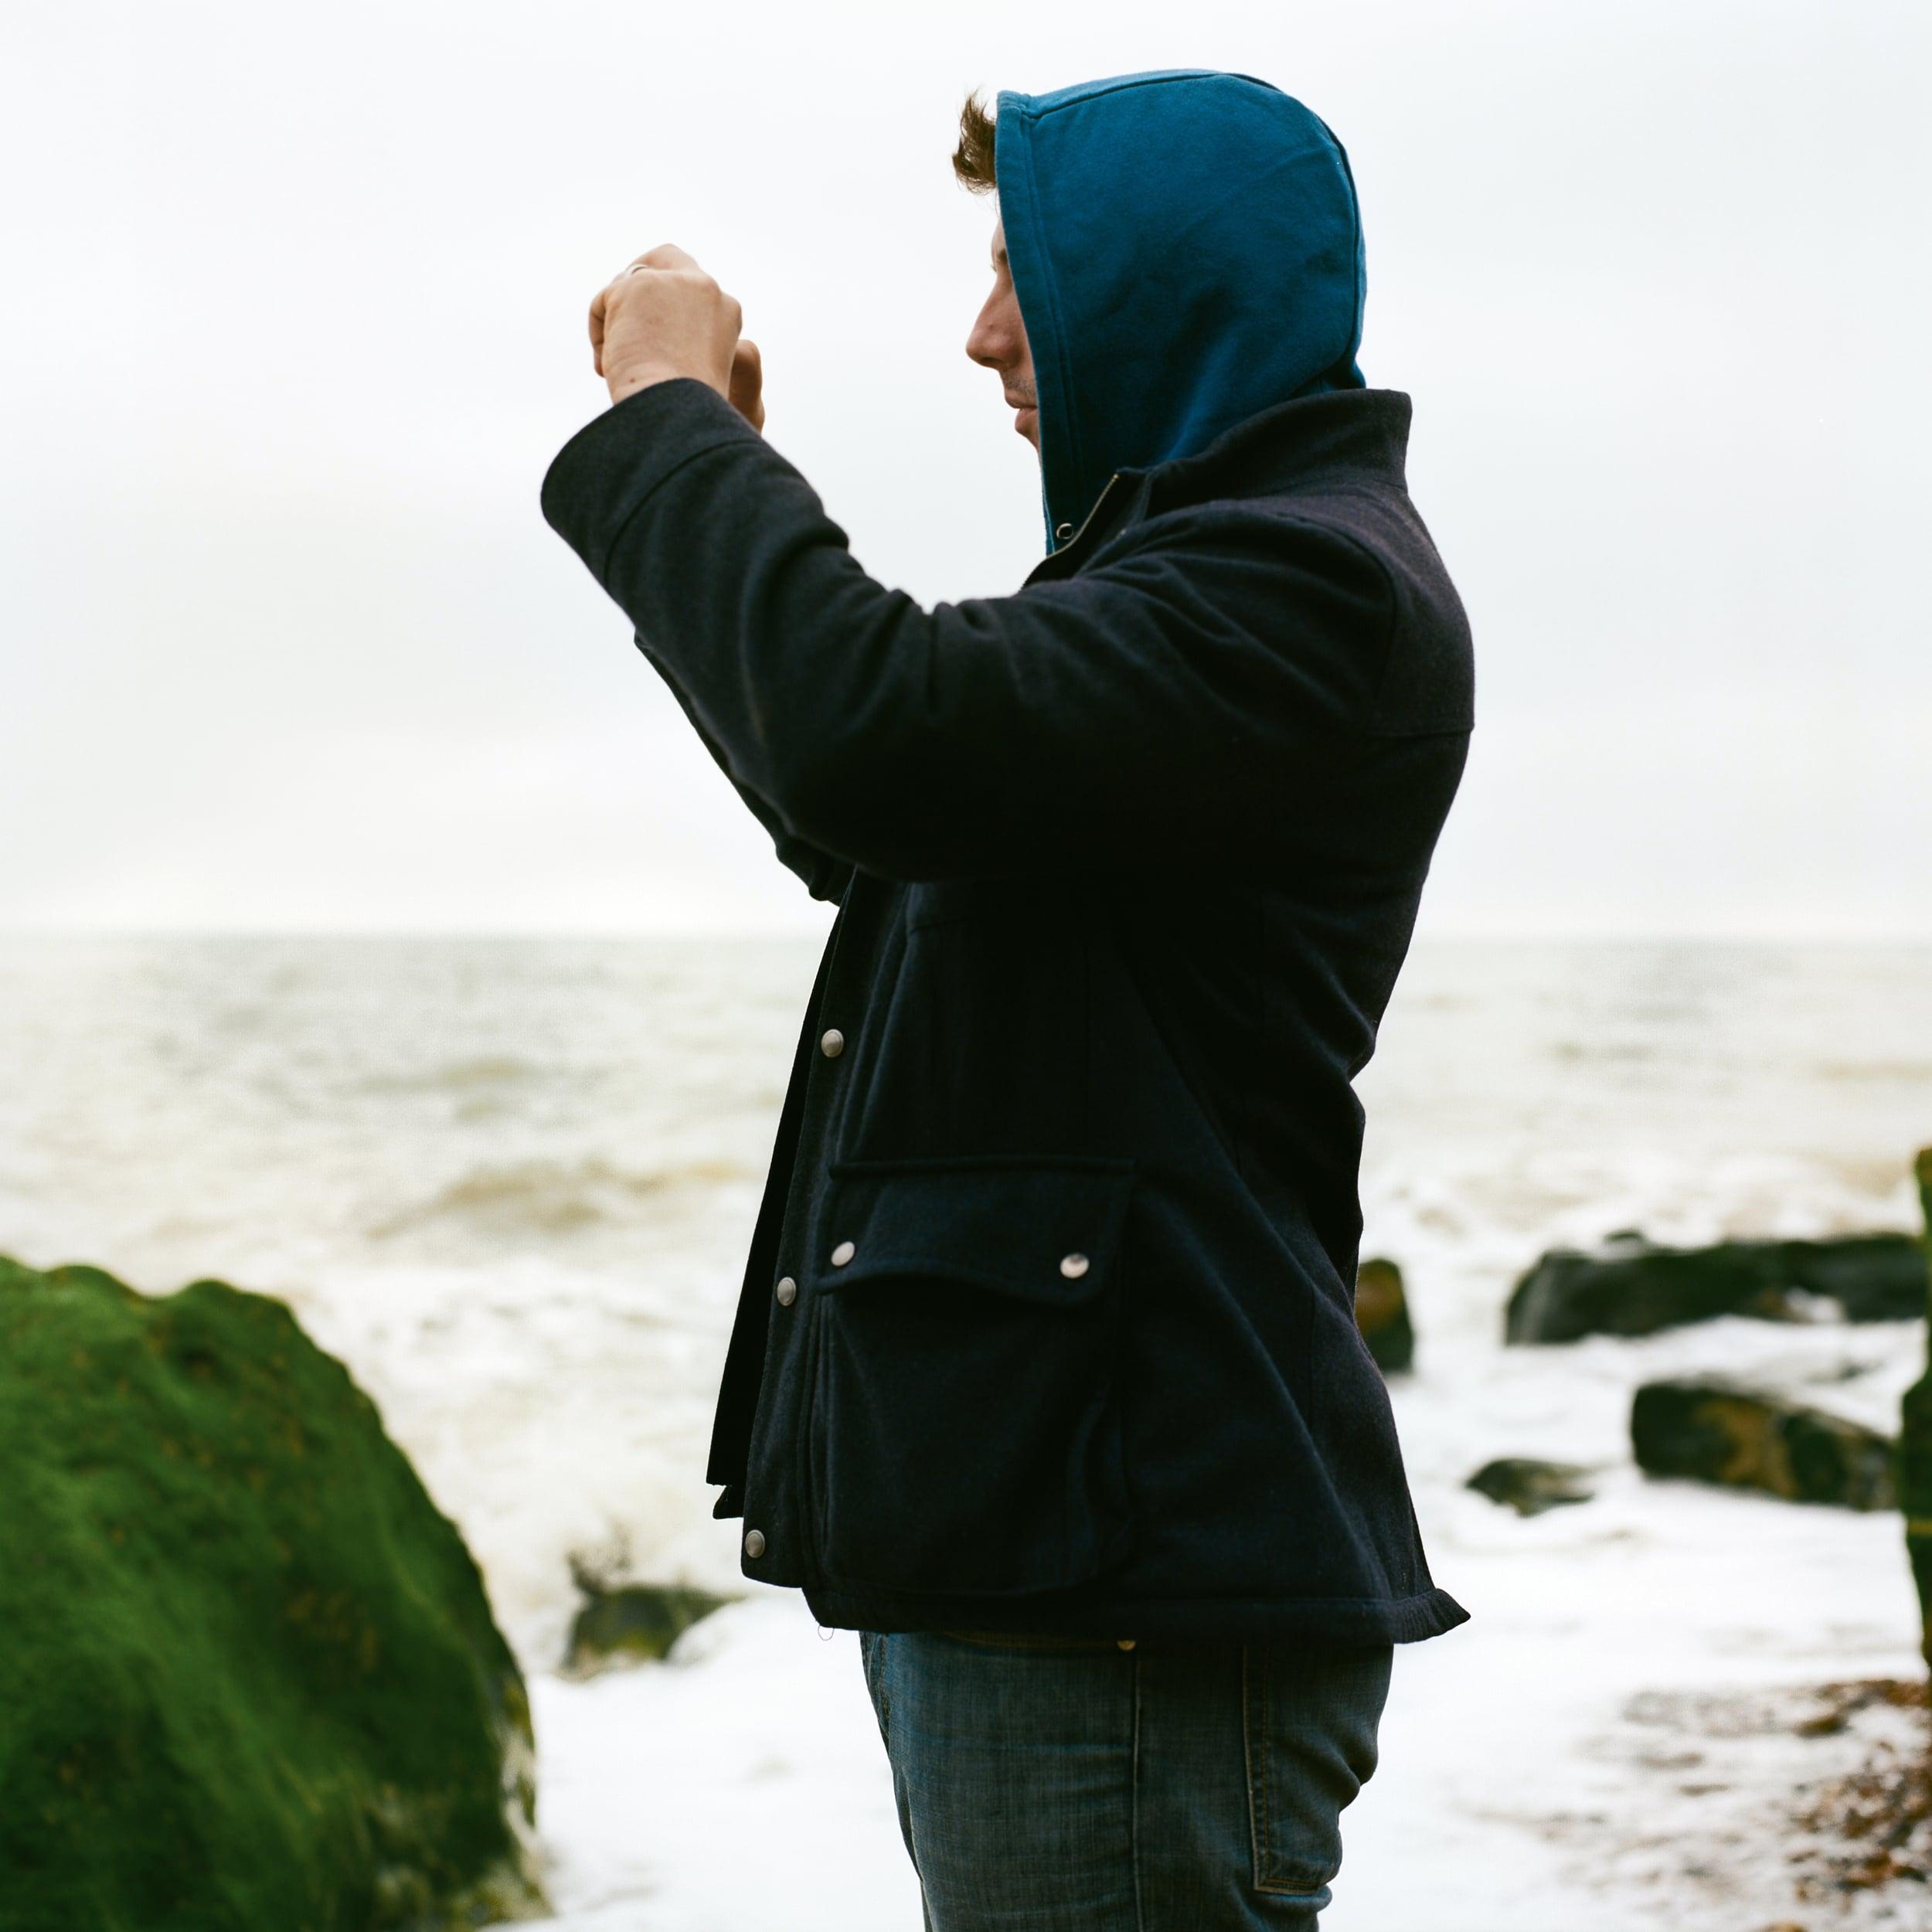 Photo of James Gifford-Mead taking photo on Hastings Coast UK